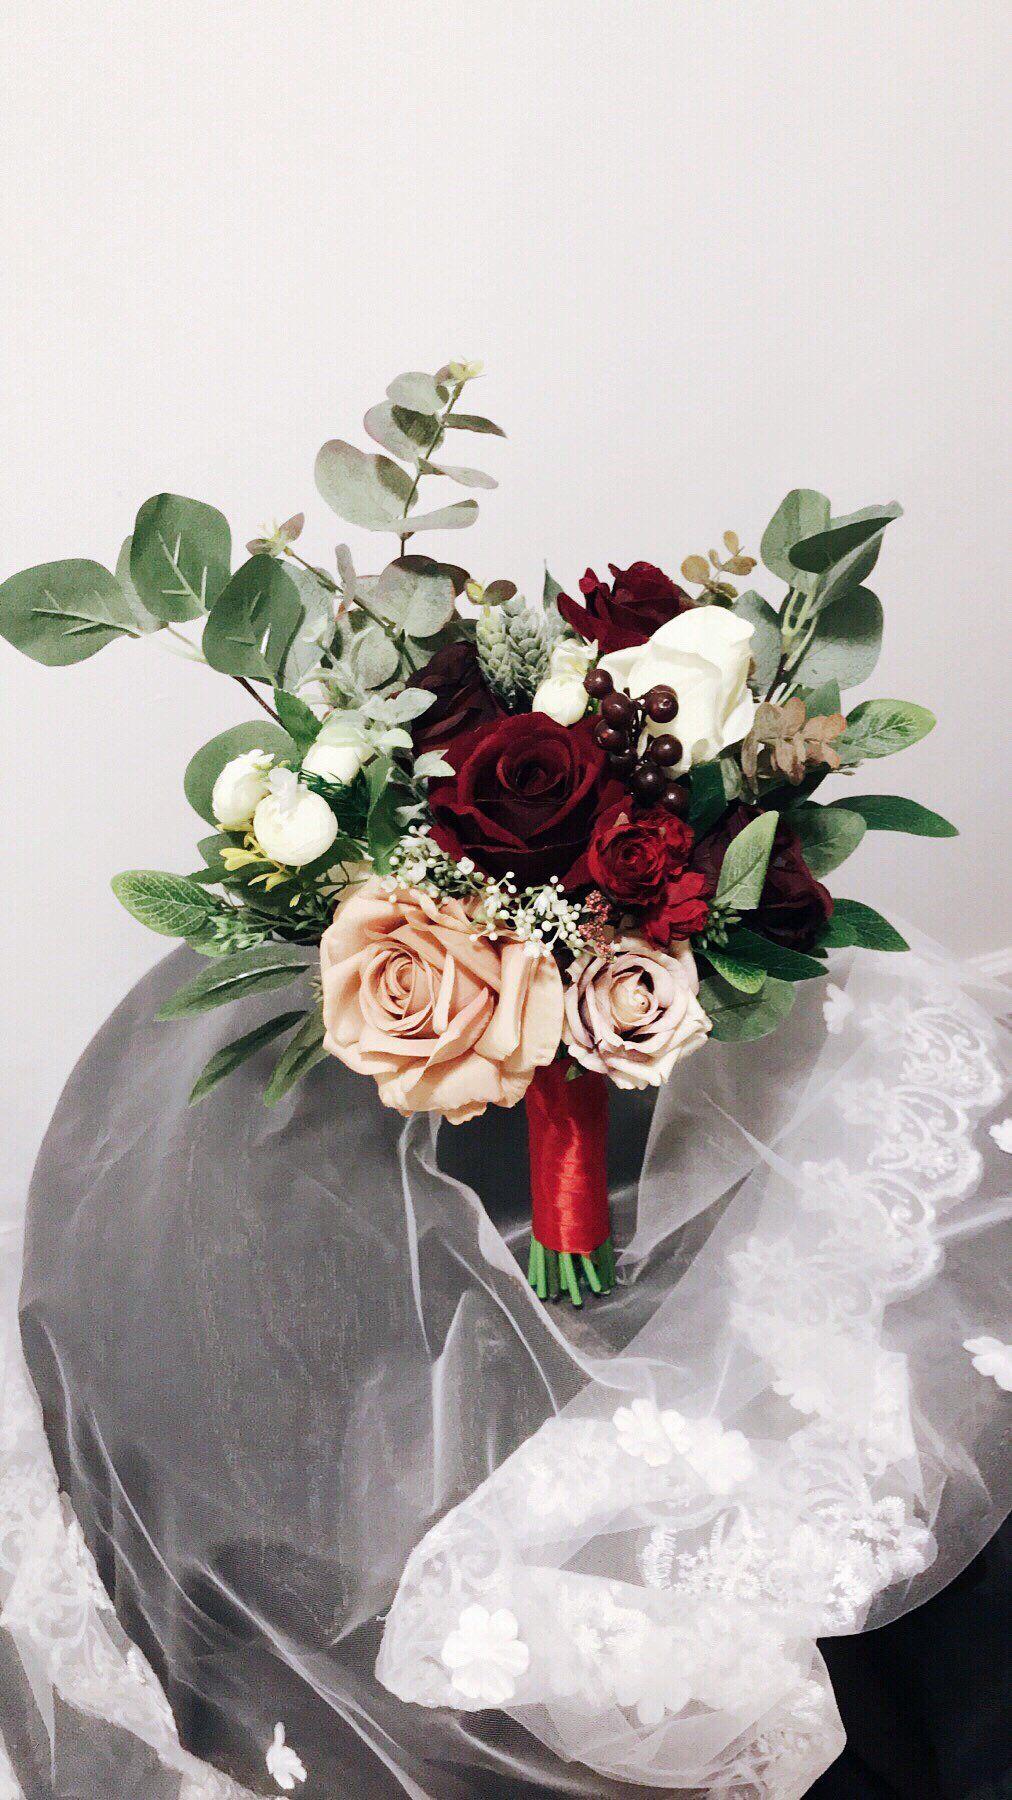 Wedding Bouquets, Bridal Bridesmaids Bouquets, Winter